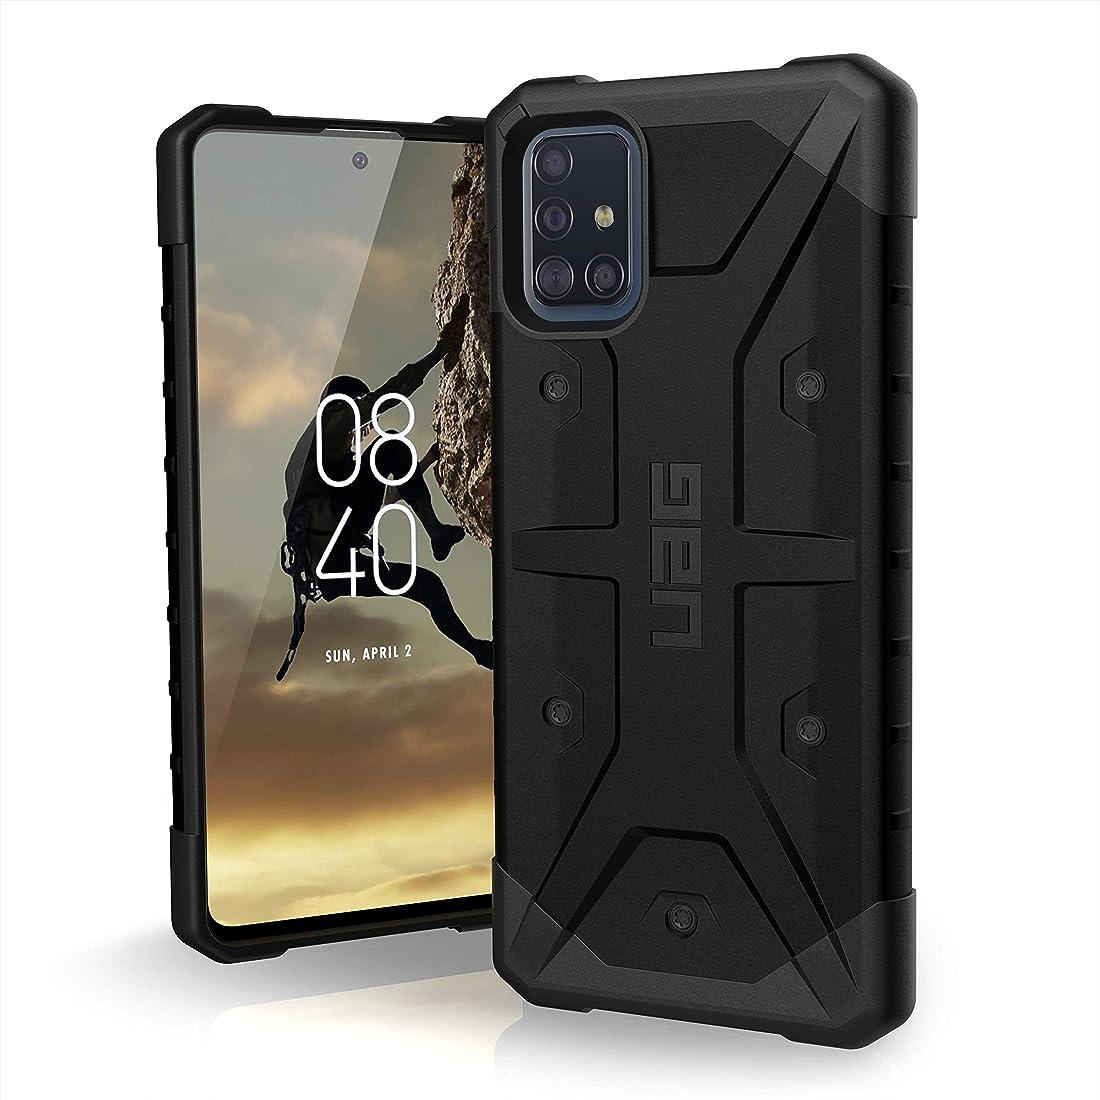 Cover per samsung galaxy a51 military standard protection cover (angoli rinforzati, crash resistant mobile 212297114040